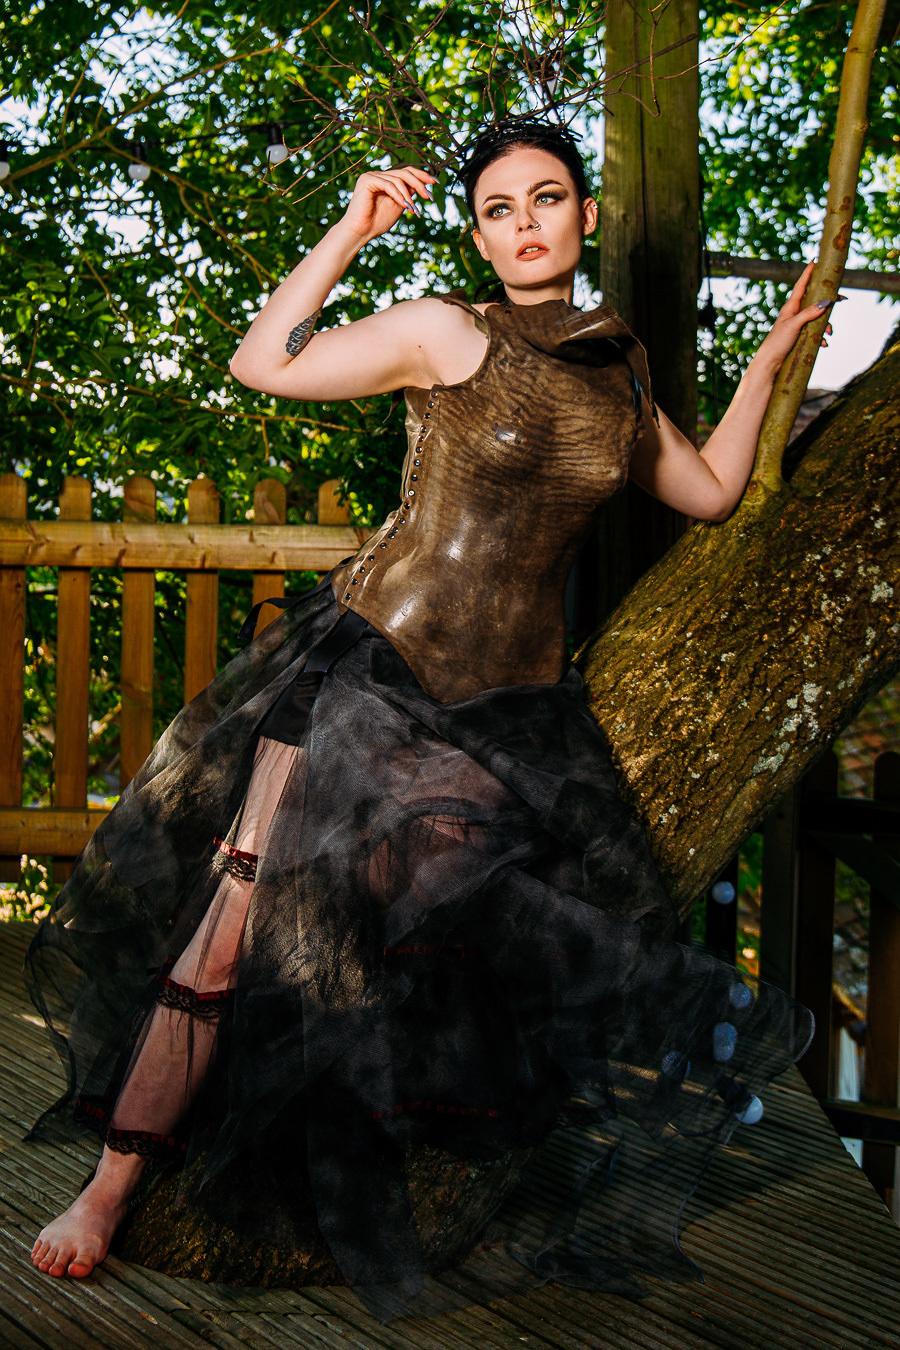 Tree Spirit / Photography by Stuart P, Model Maleficent, Post processing by Stuart P, Stylist The Creativity Hub / Uploaded 13th October 2021 @ 09:35 AM